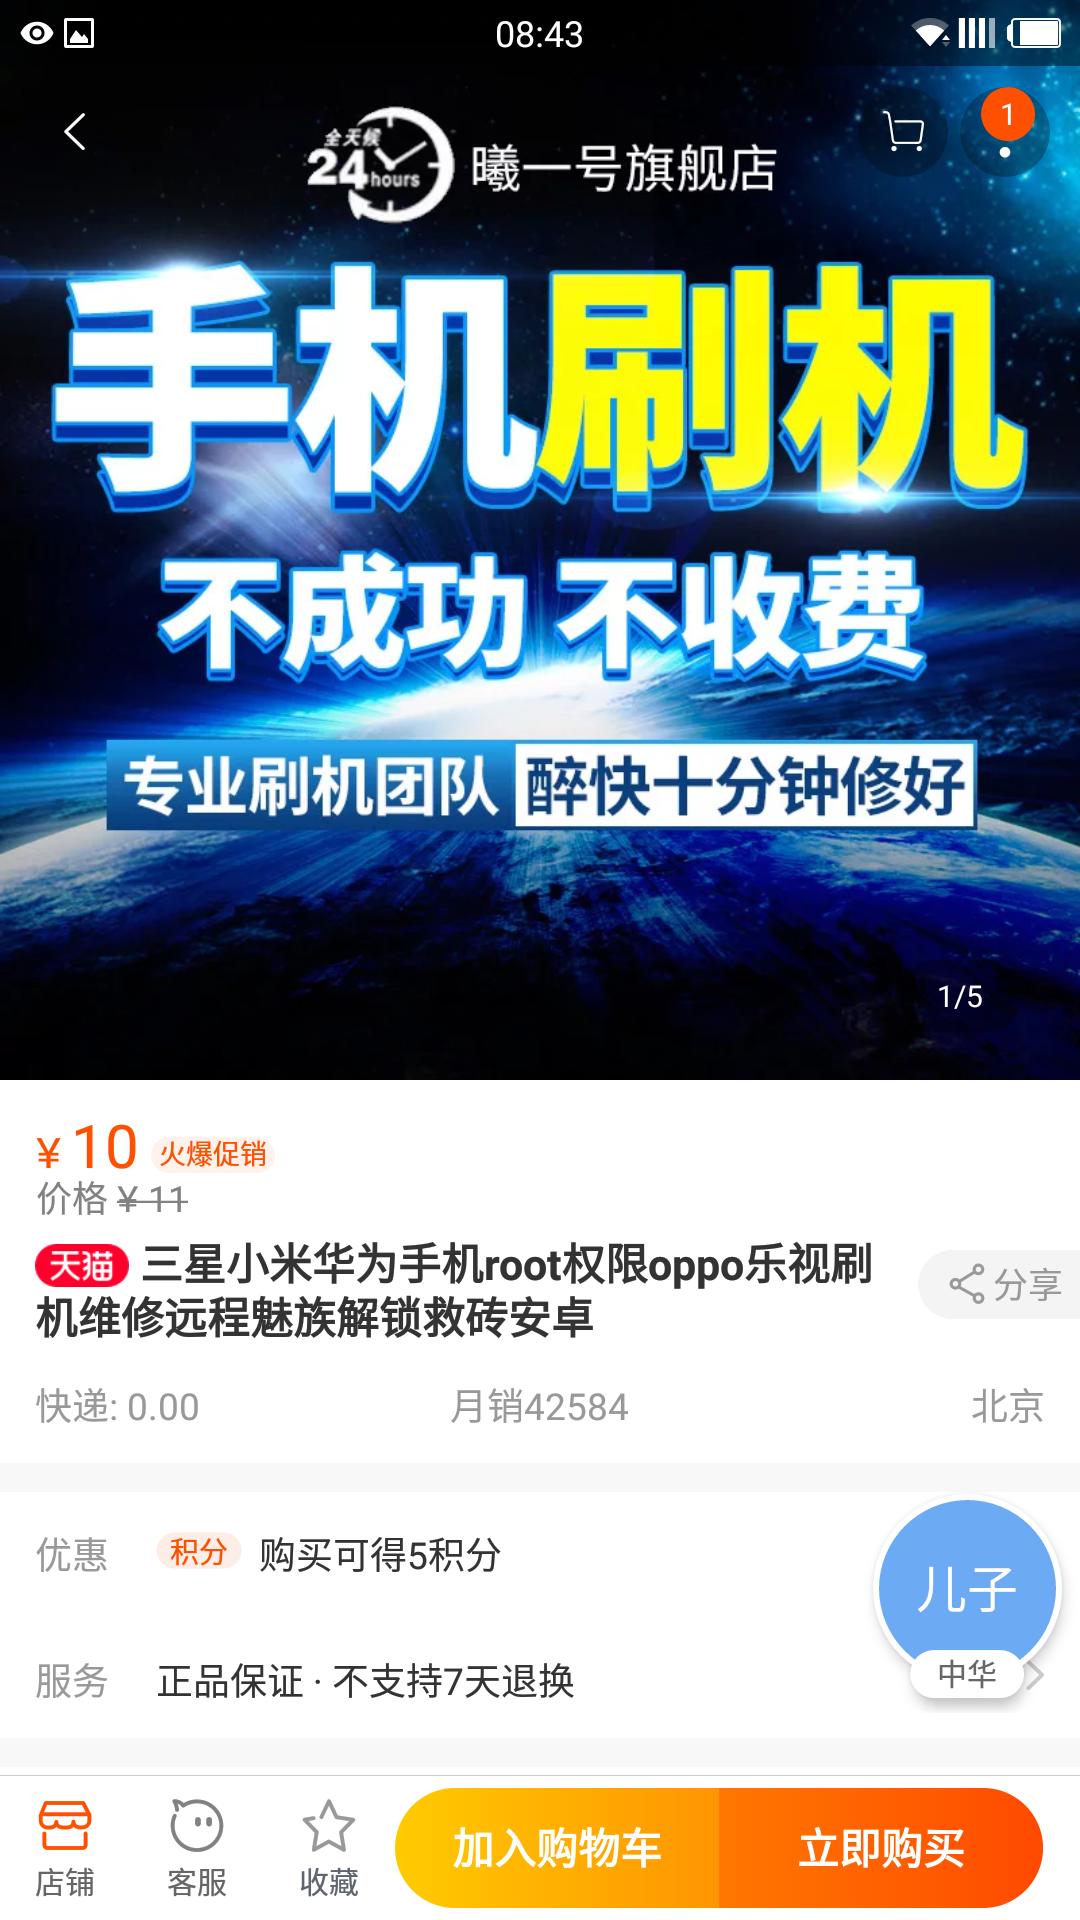 Screenshot_20190105-084352.png